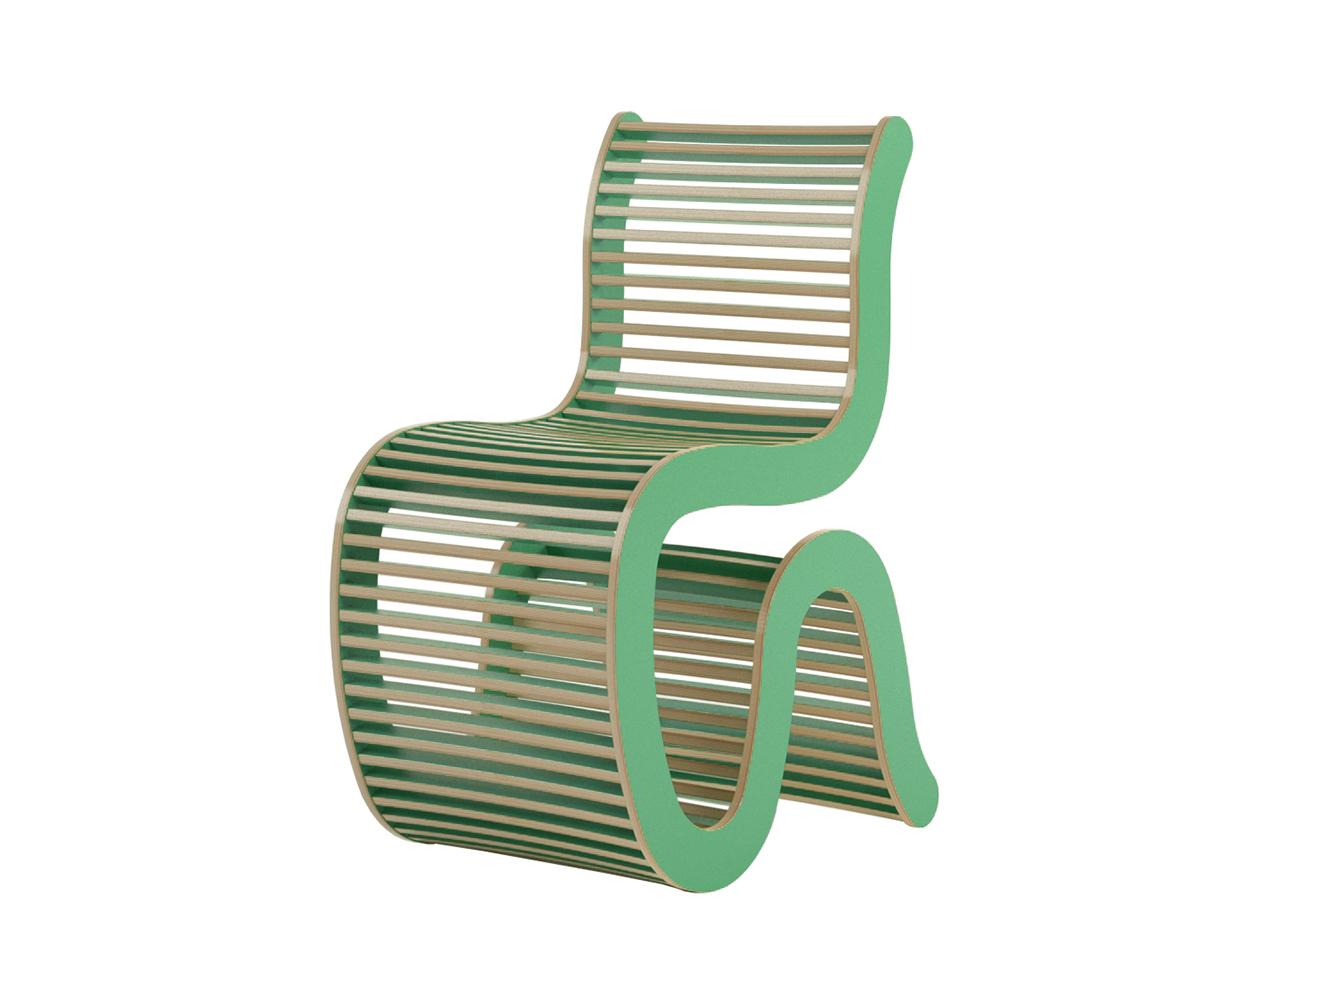 Стул linea (studiola) зеленый 43x88x65 см.